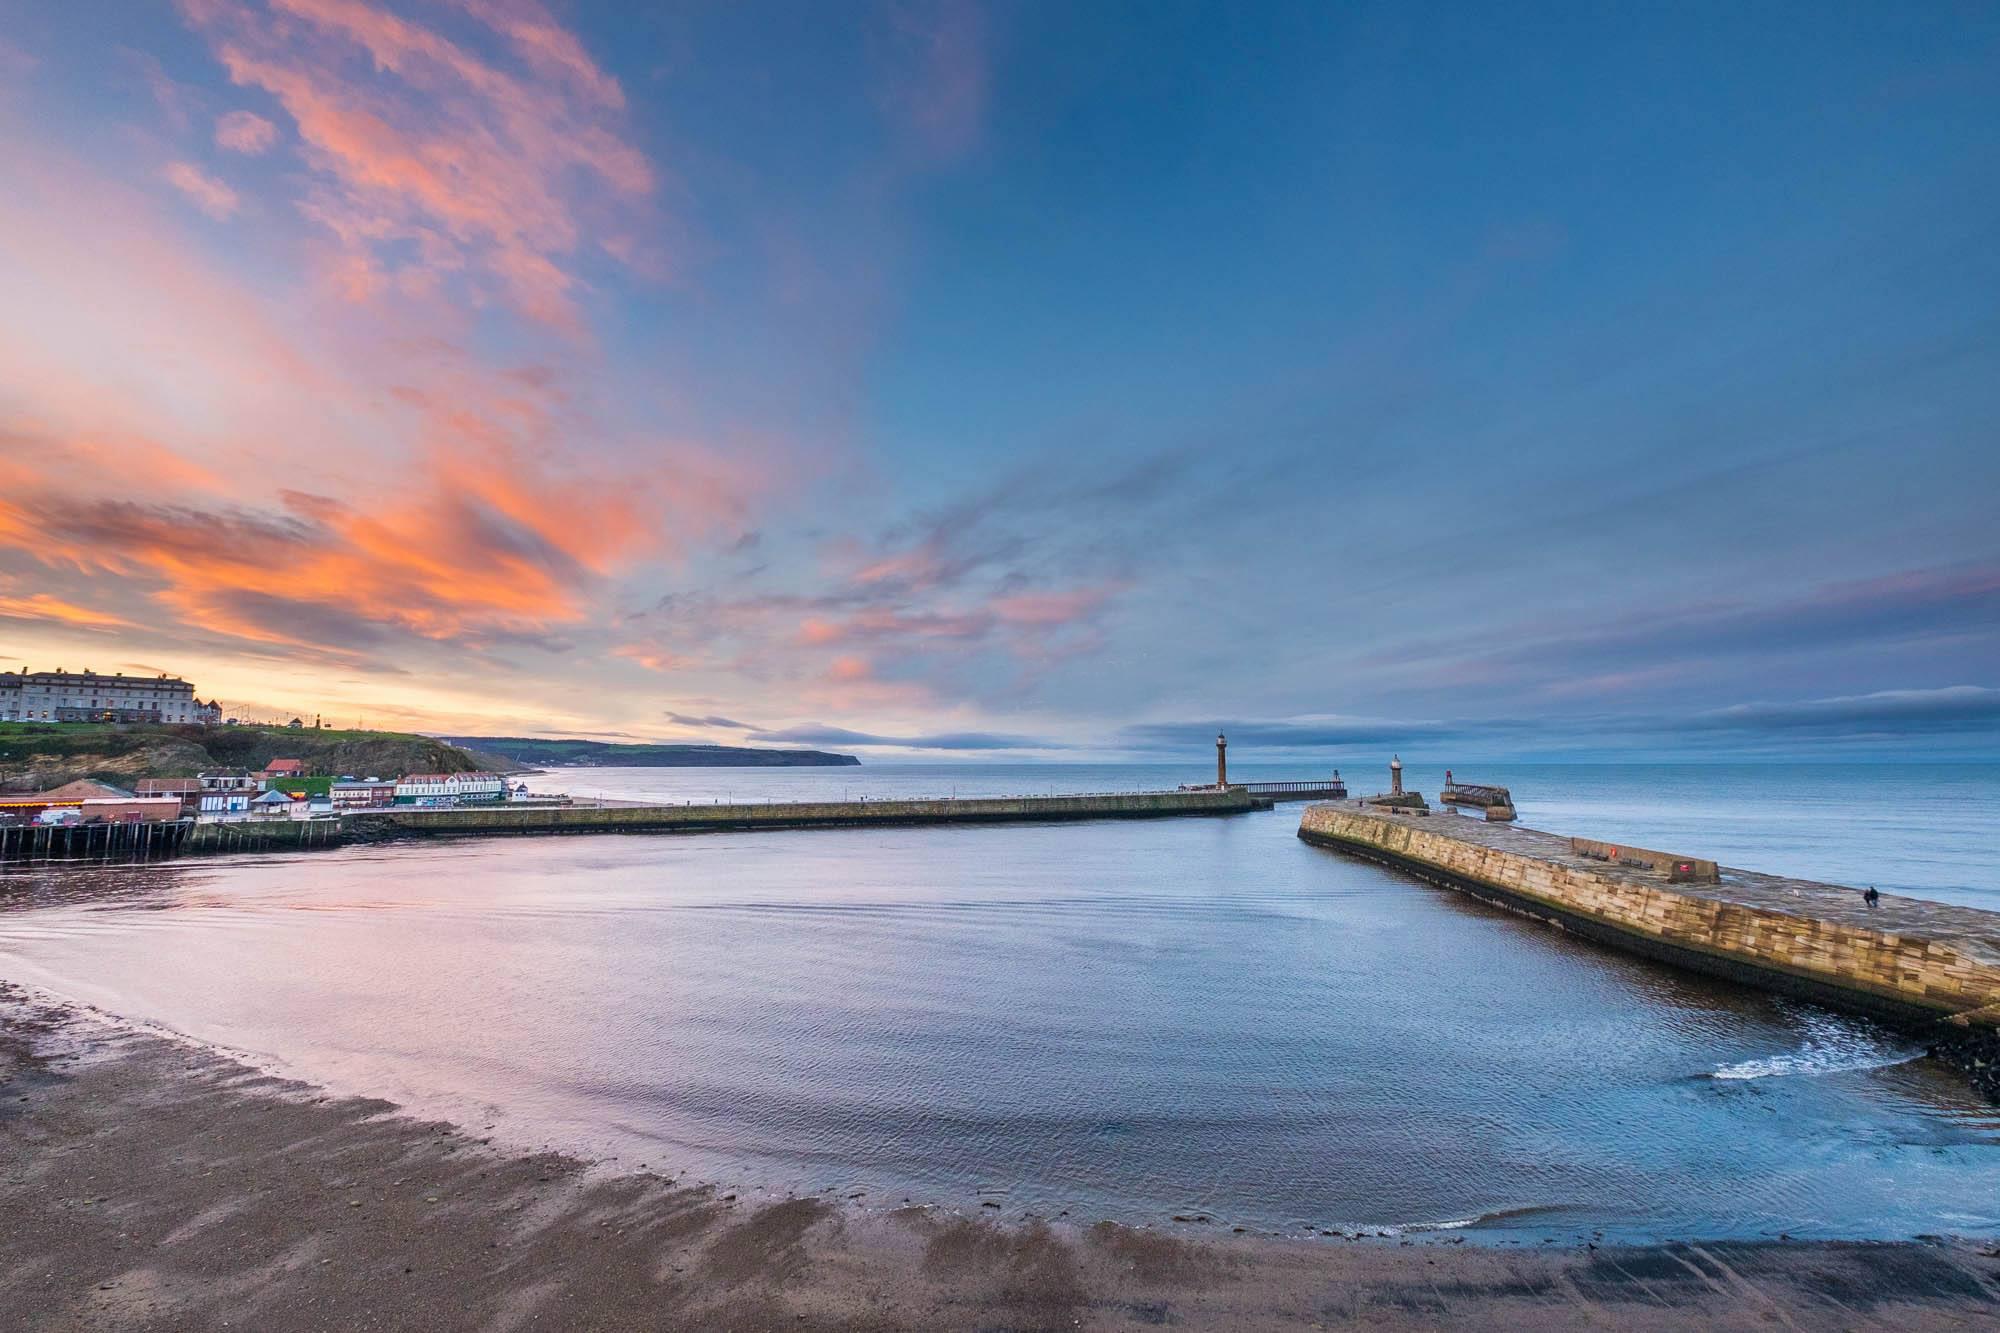 Sunset Whitby Pier